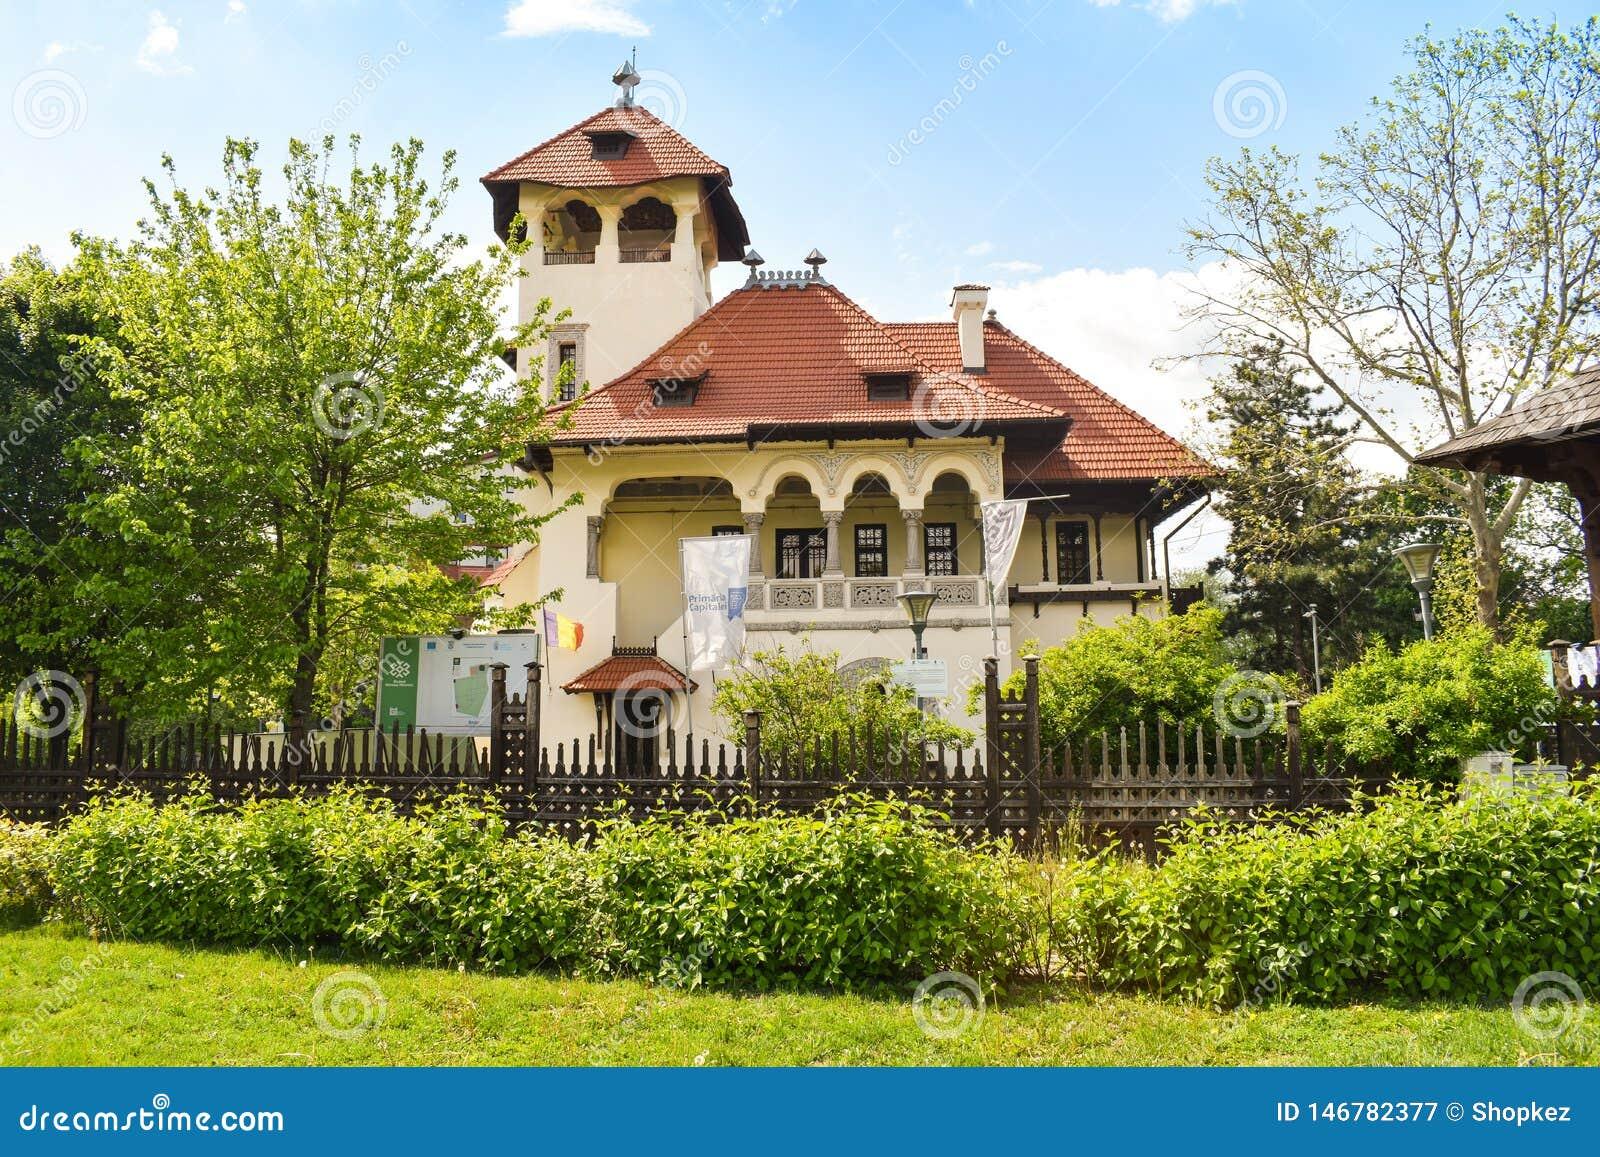 Krajowy muzeum sztuki 04 - Bucharest, Rumunia - 05 2019